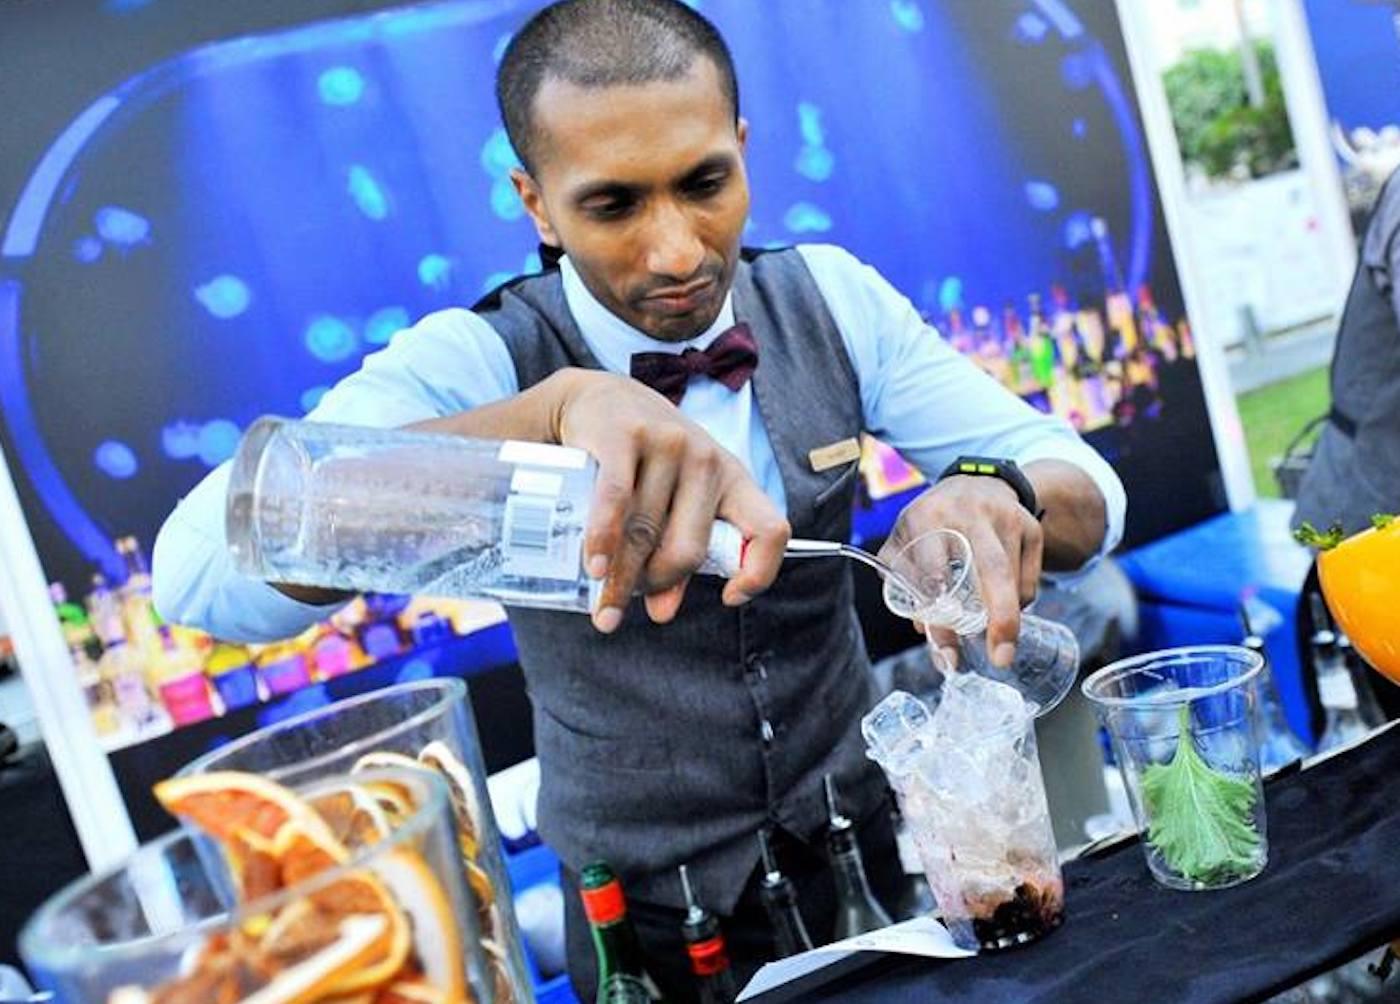 Singapore Cocktail Festival Highlights | Festival Village